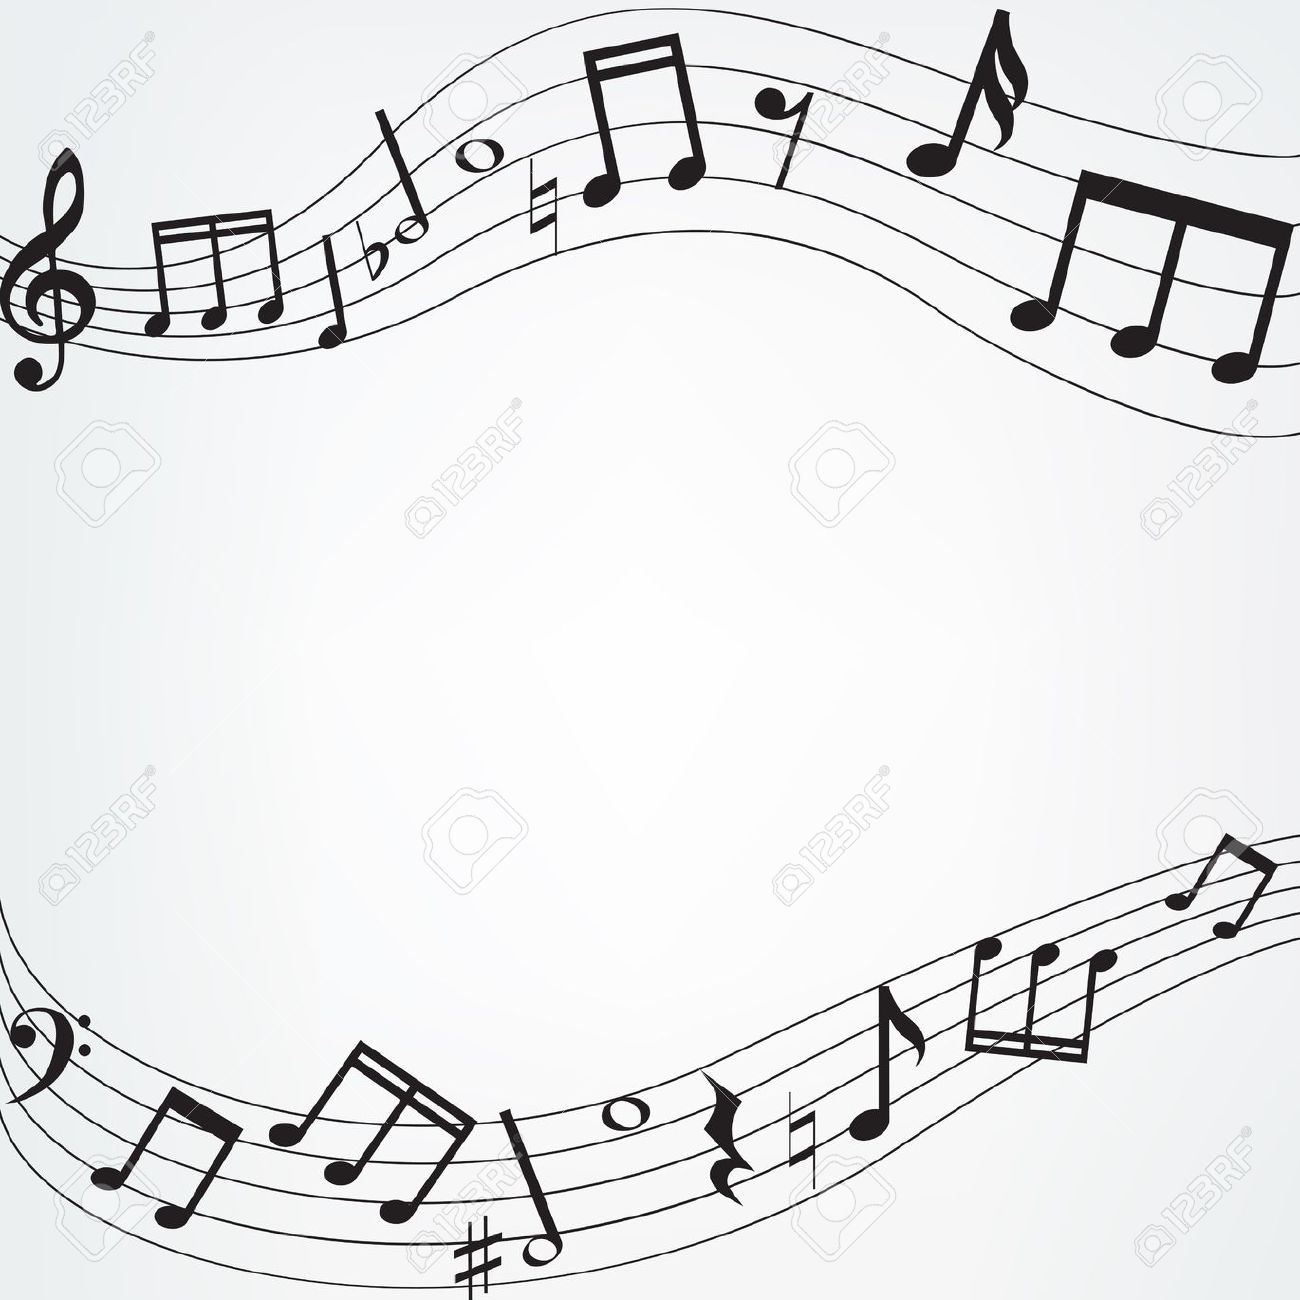 Free Music Borders Clip Art-Free Music Borders Clip Art-19